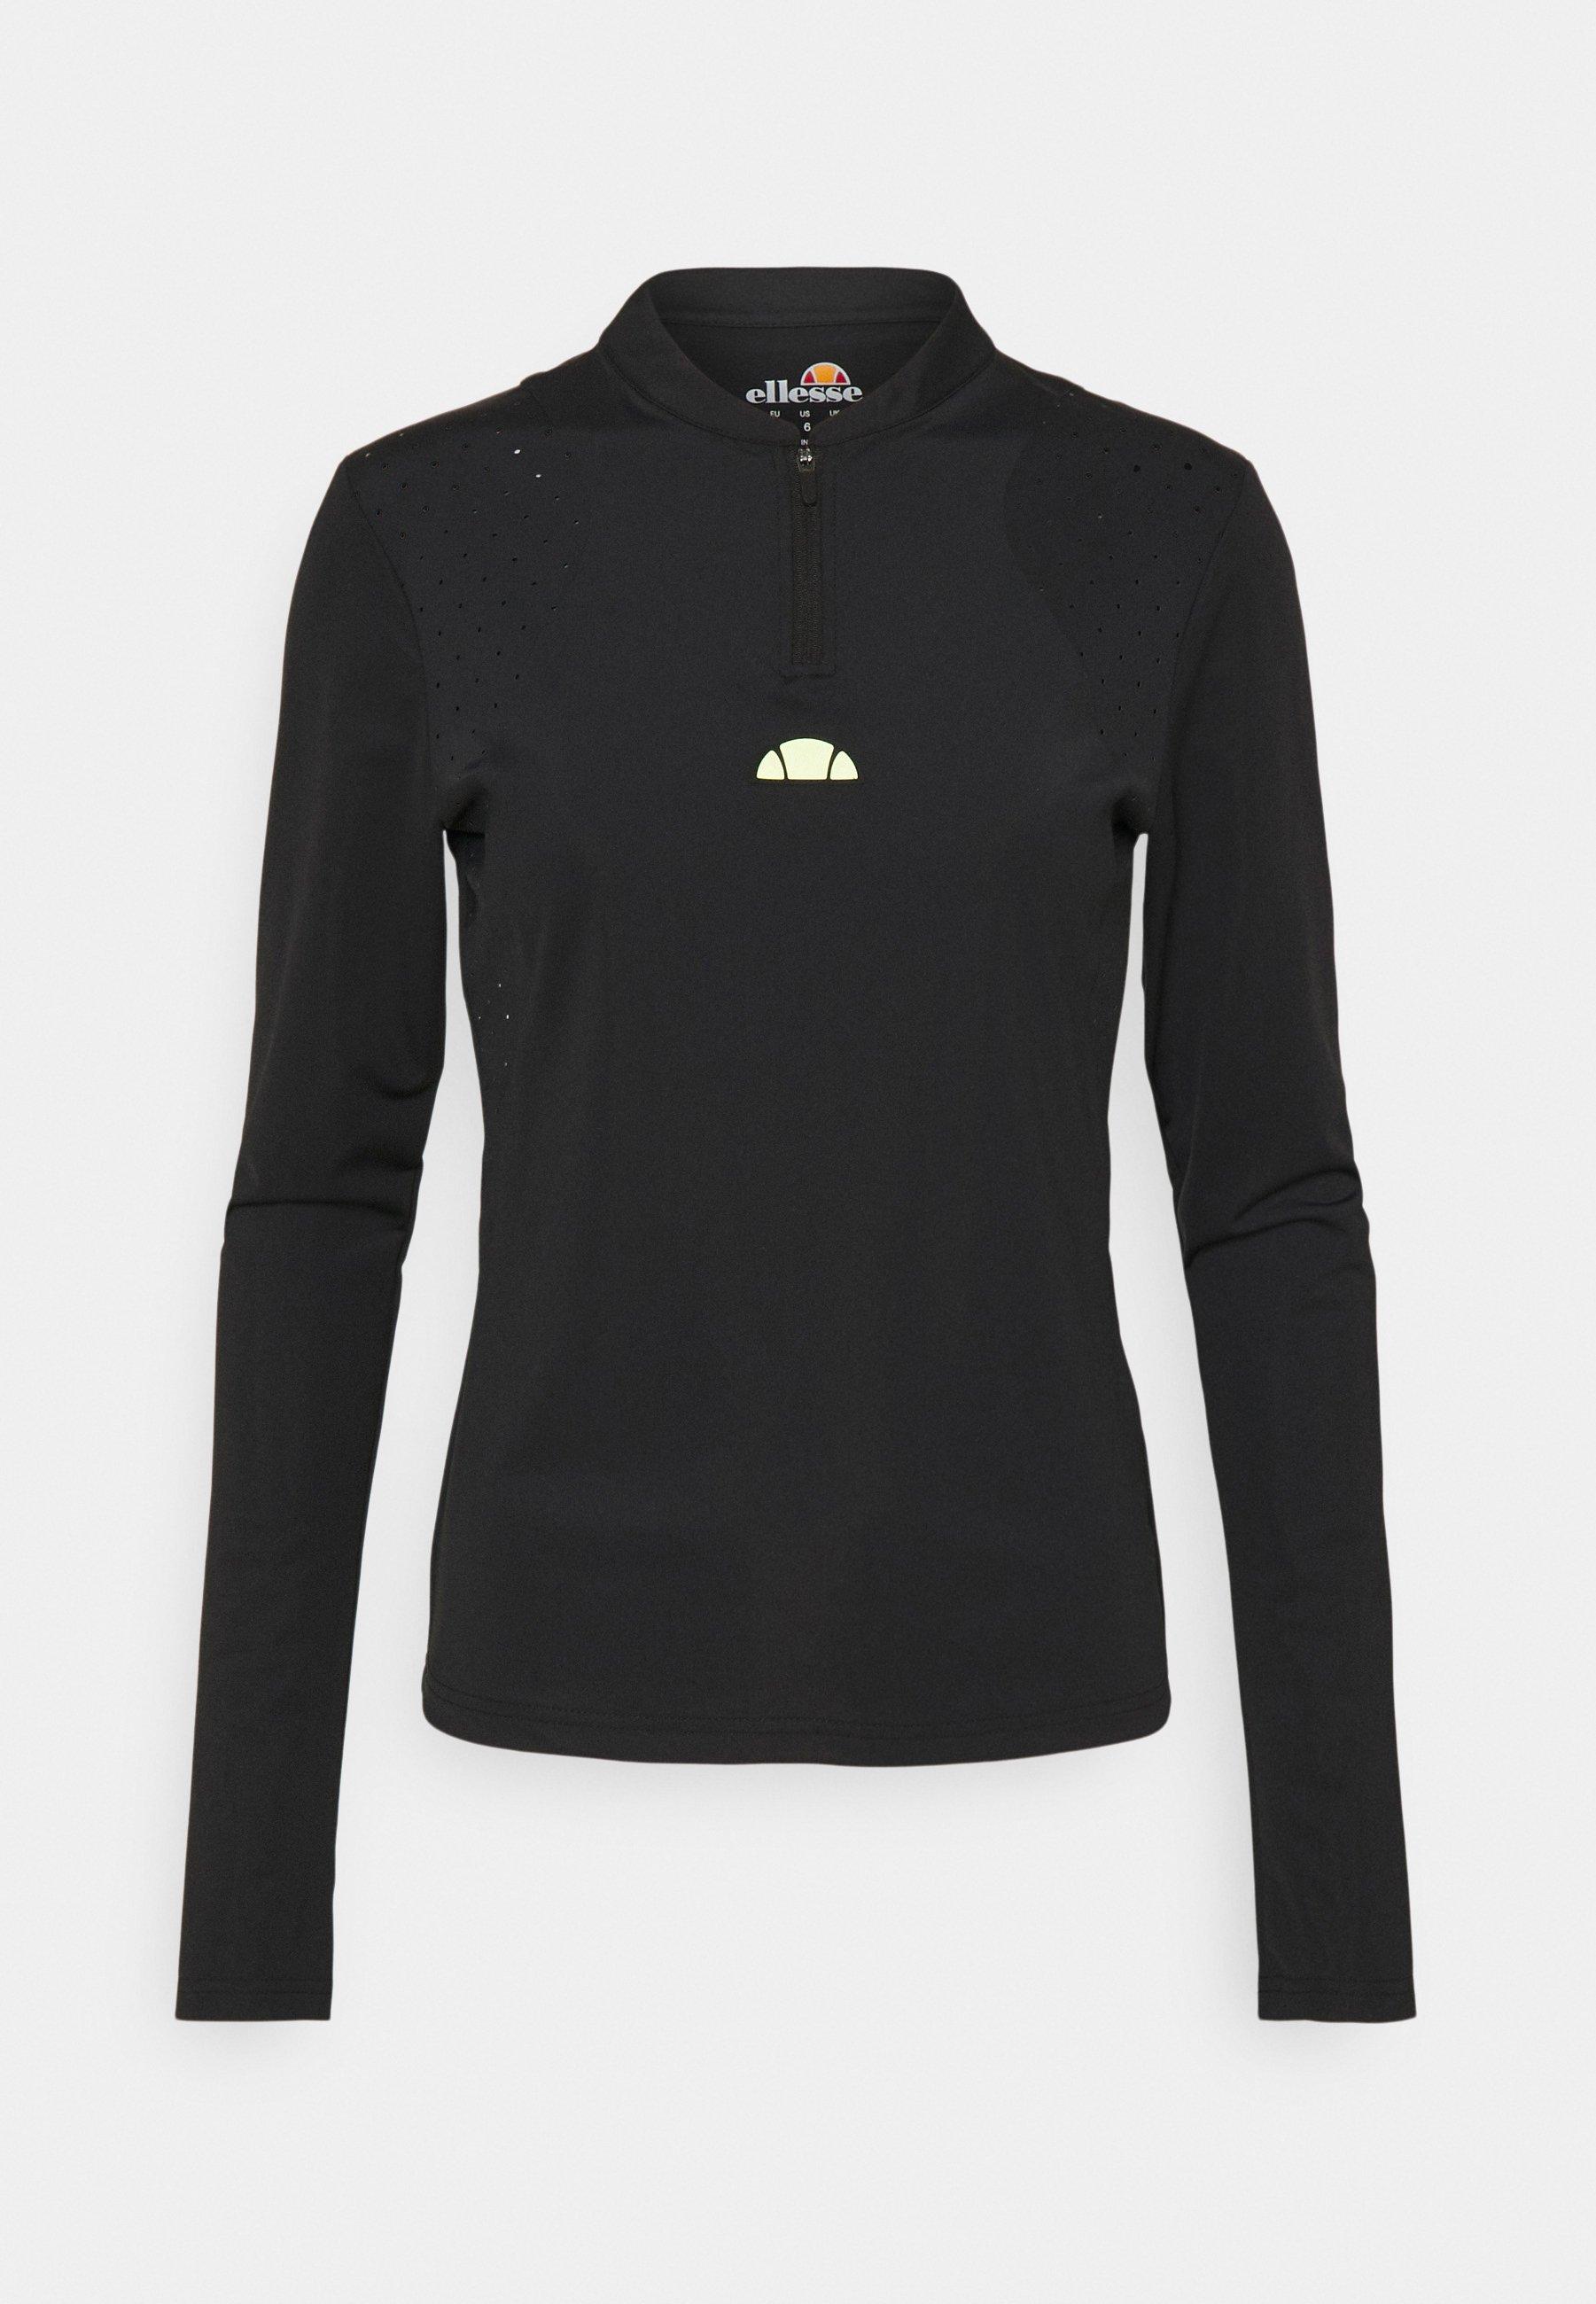 Femme PULETTI 1/2 ZIP - T-shirt à manches longues